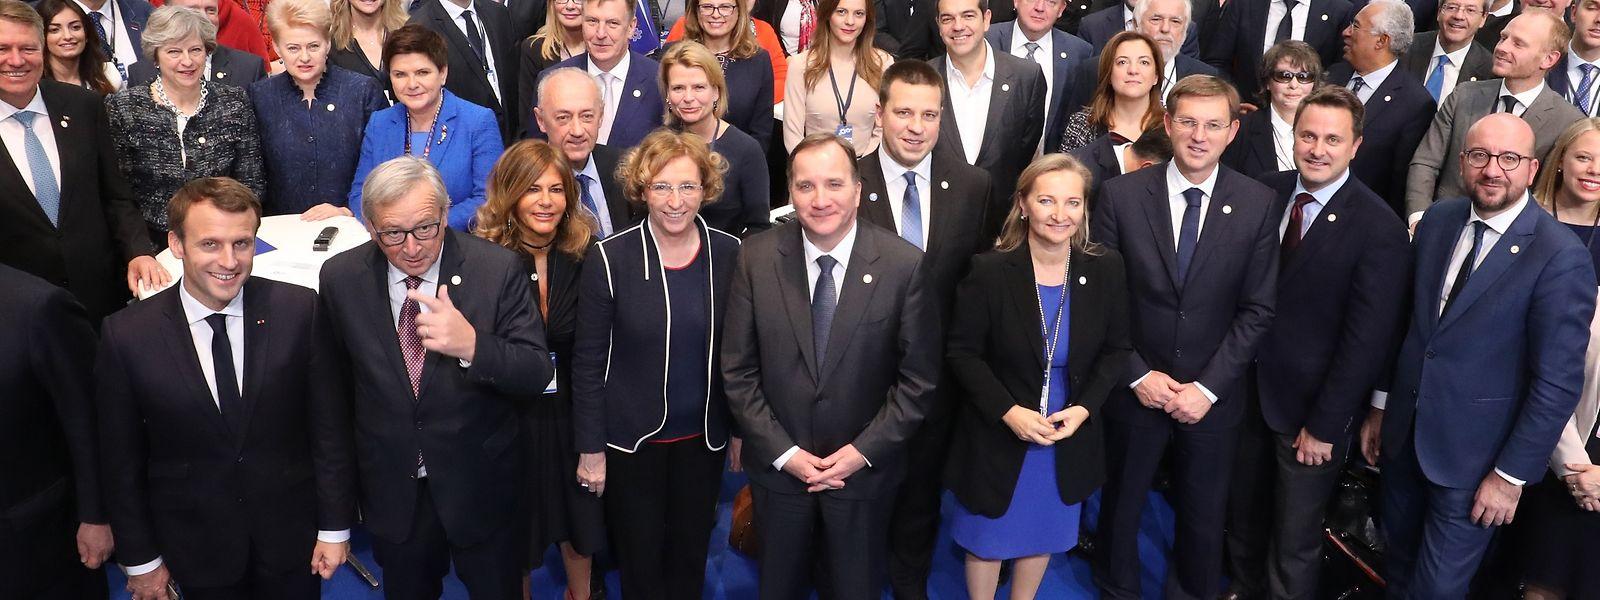 Enquanto Jean-Claude Juncker posou ao lado de Macron, enquanto Bettel ficou no outro extremo